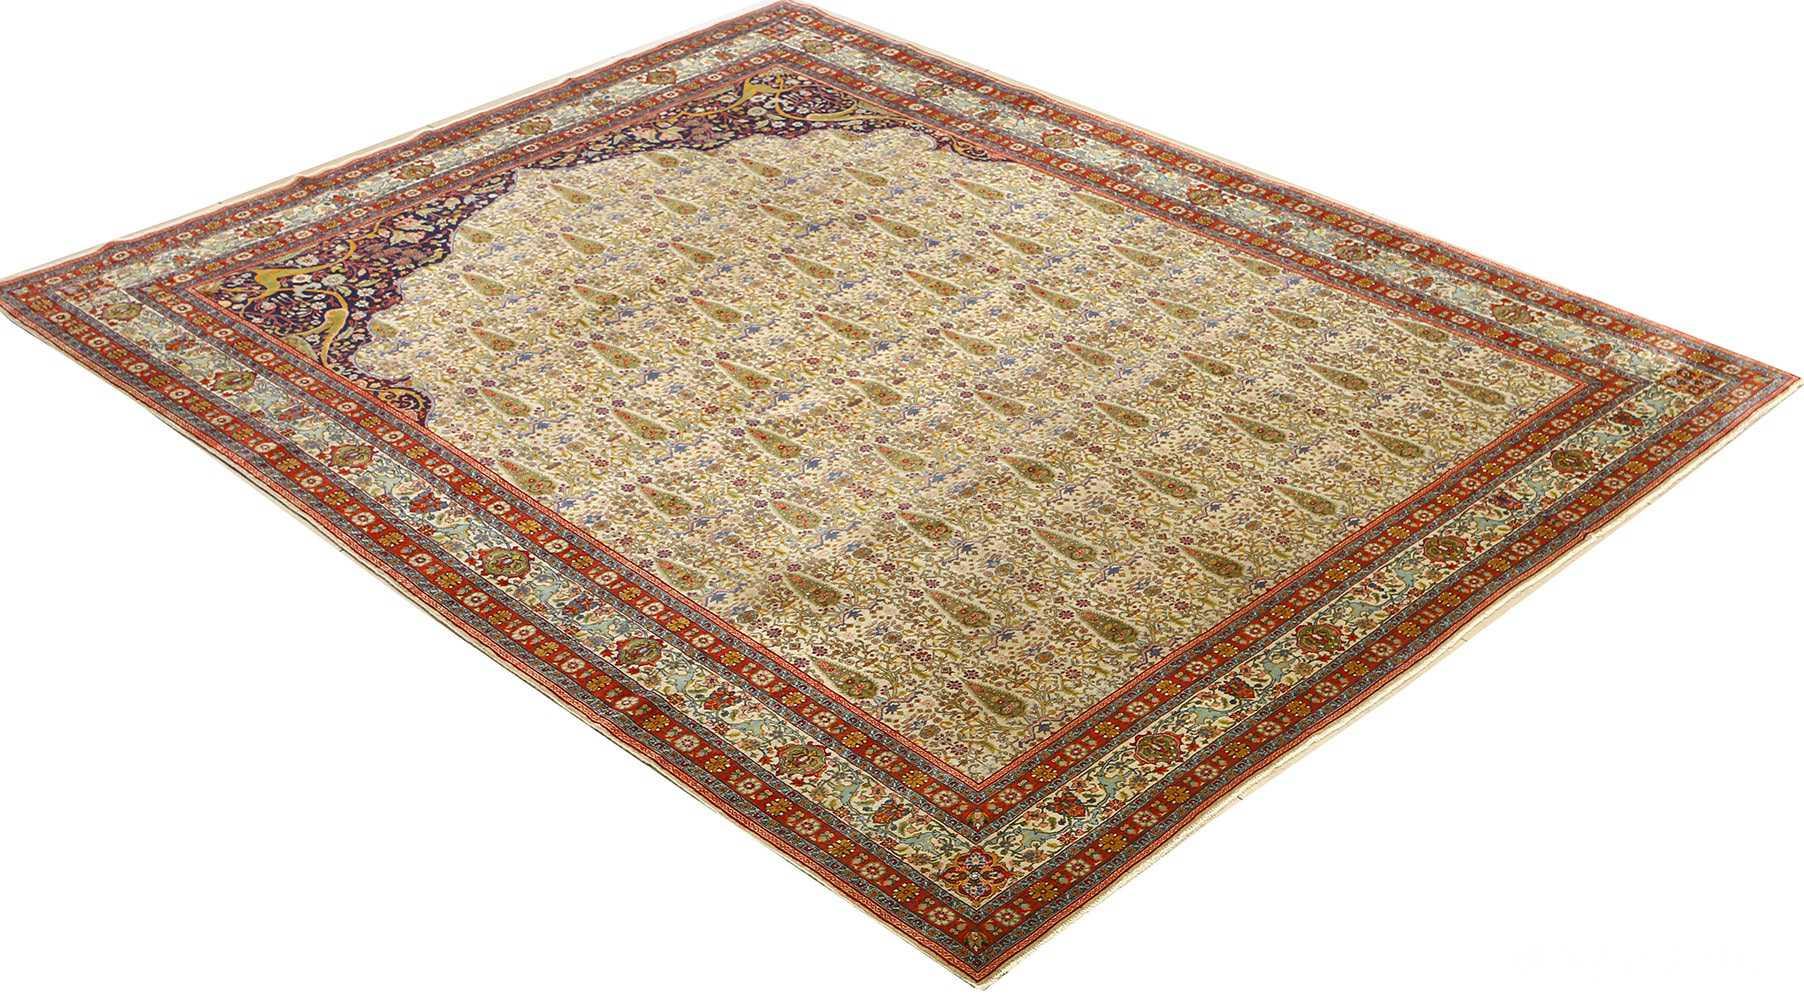 antique prayer design tabriz persian rug 51111 side Nazmiyal